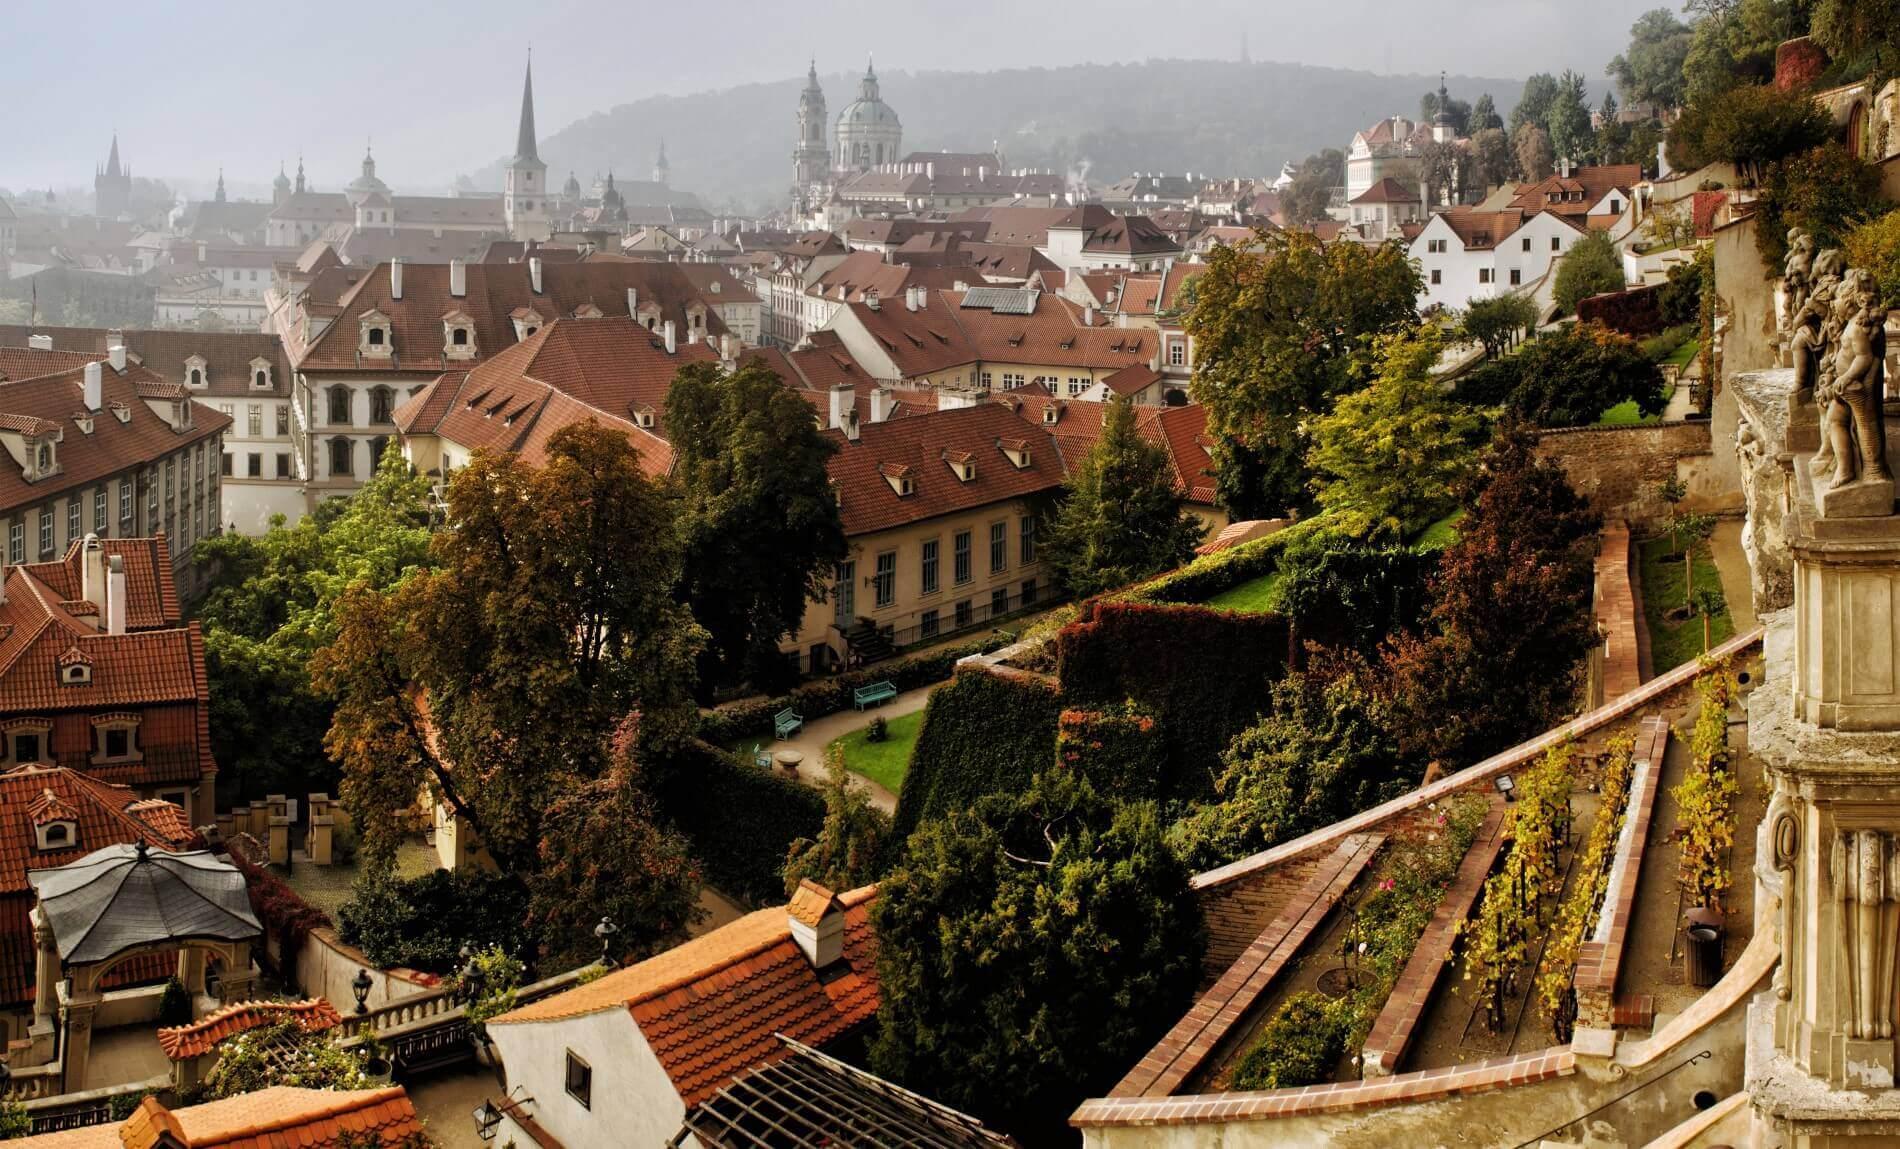 Le jardin en pente de Velka Palffyovska © Prague City Tourisma